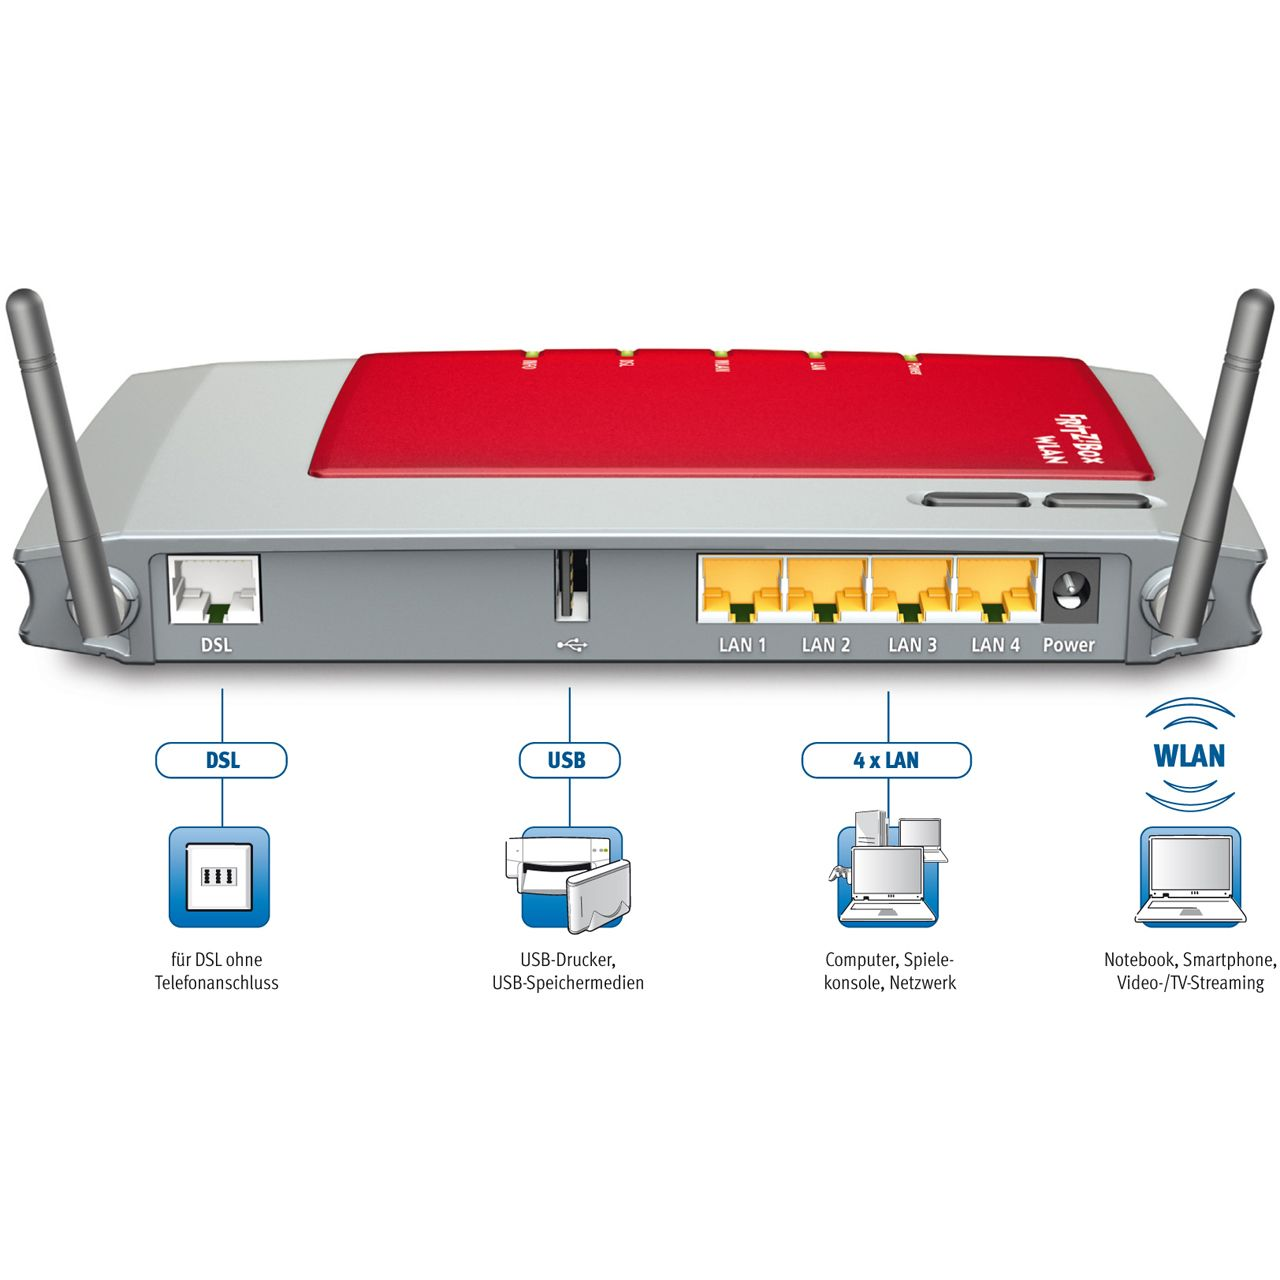 AVM FRITBox 3270 WLAN N 4 Port Router 300Mbit/s - WLAN Router + ...